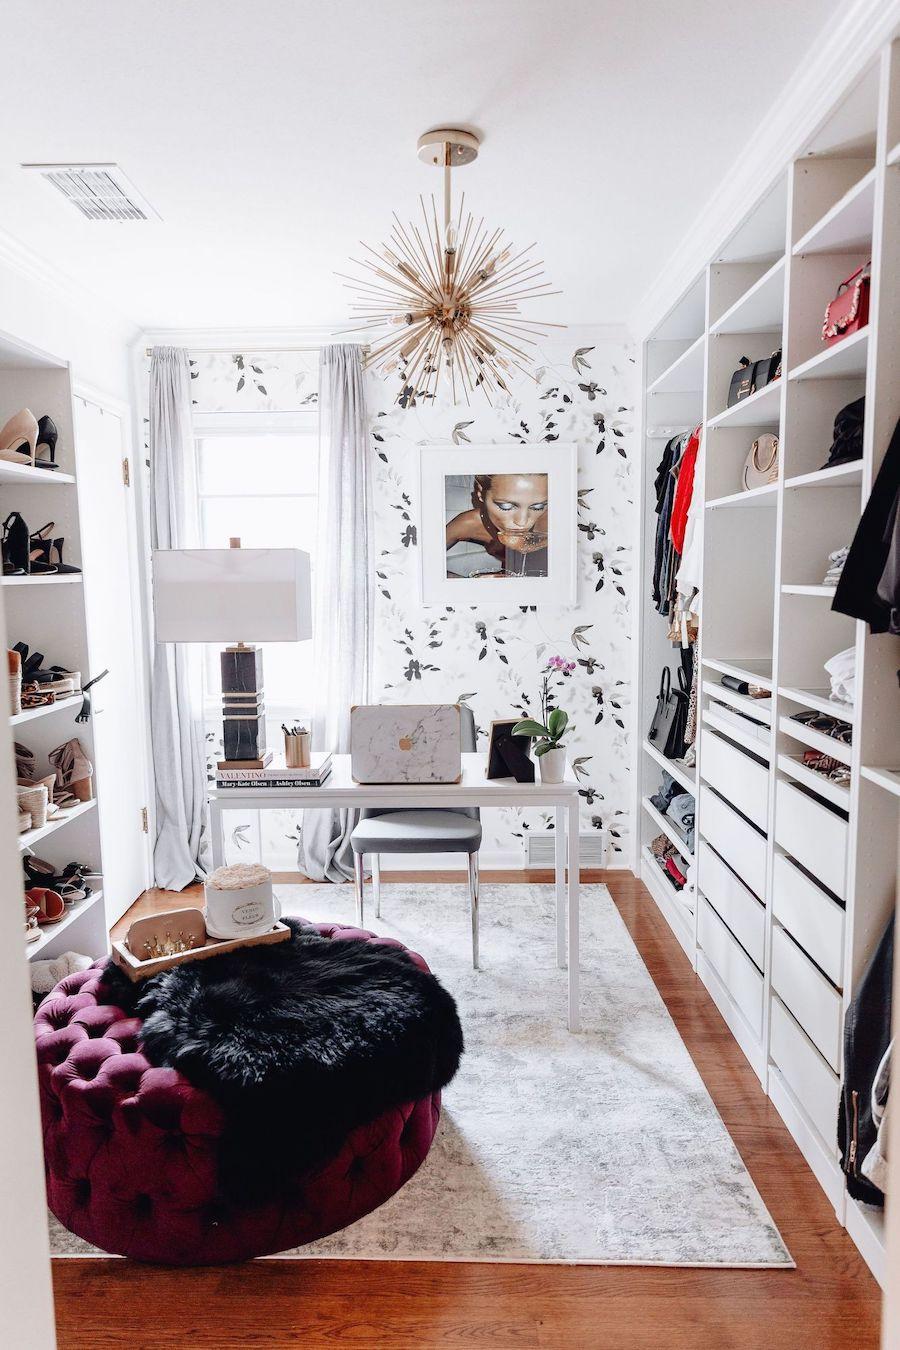 How to Convert a Closet into an Office